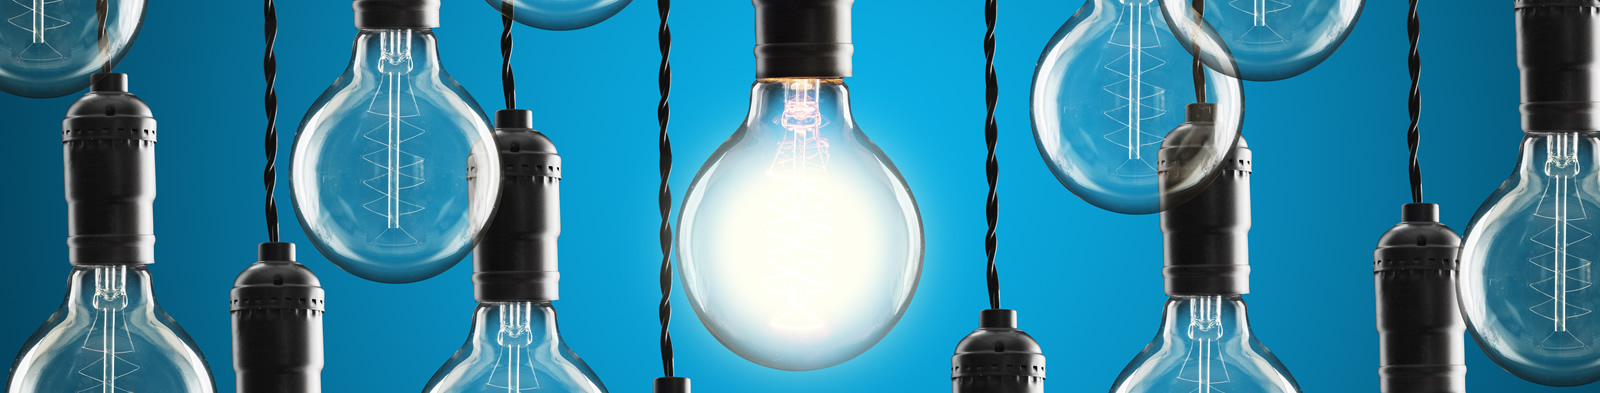 A group of hanging lightbulbs